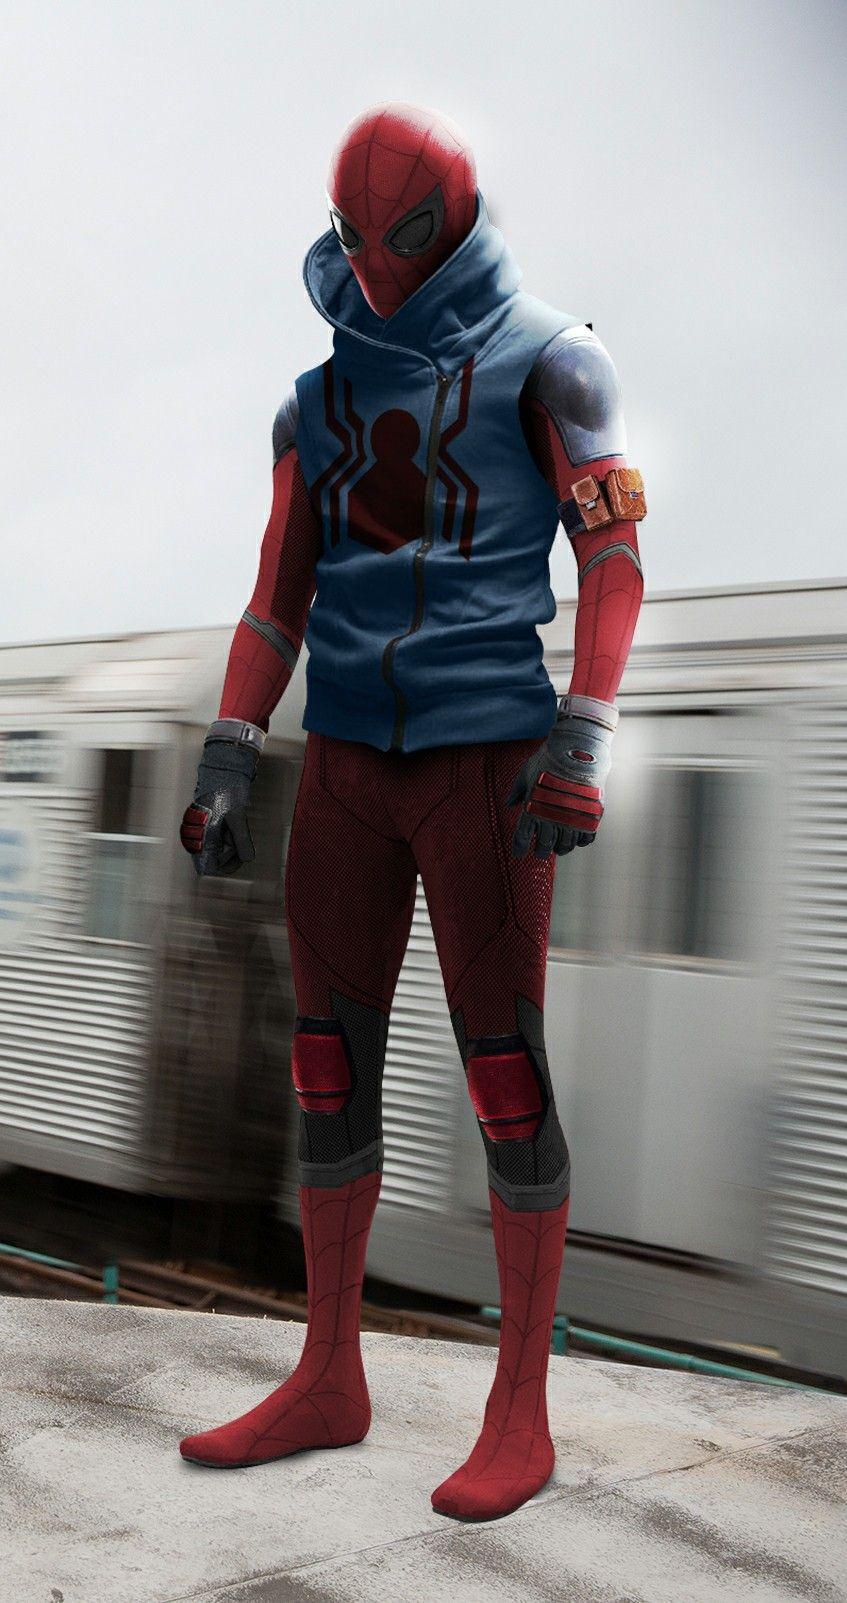 Miglior regalo LEGGENDE SPIDER-MAN BLACK SYMBIOTE Tuta Loose Action Figure